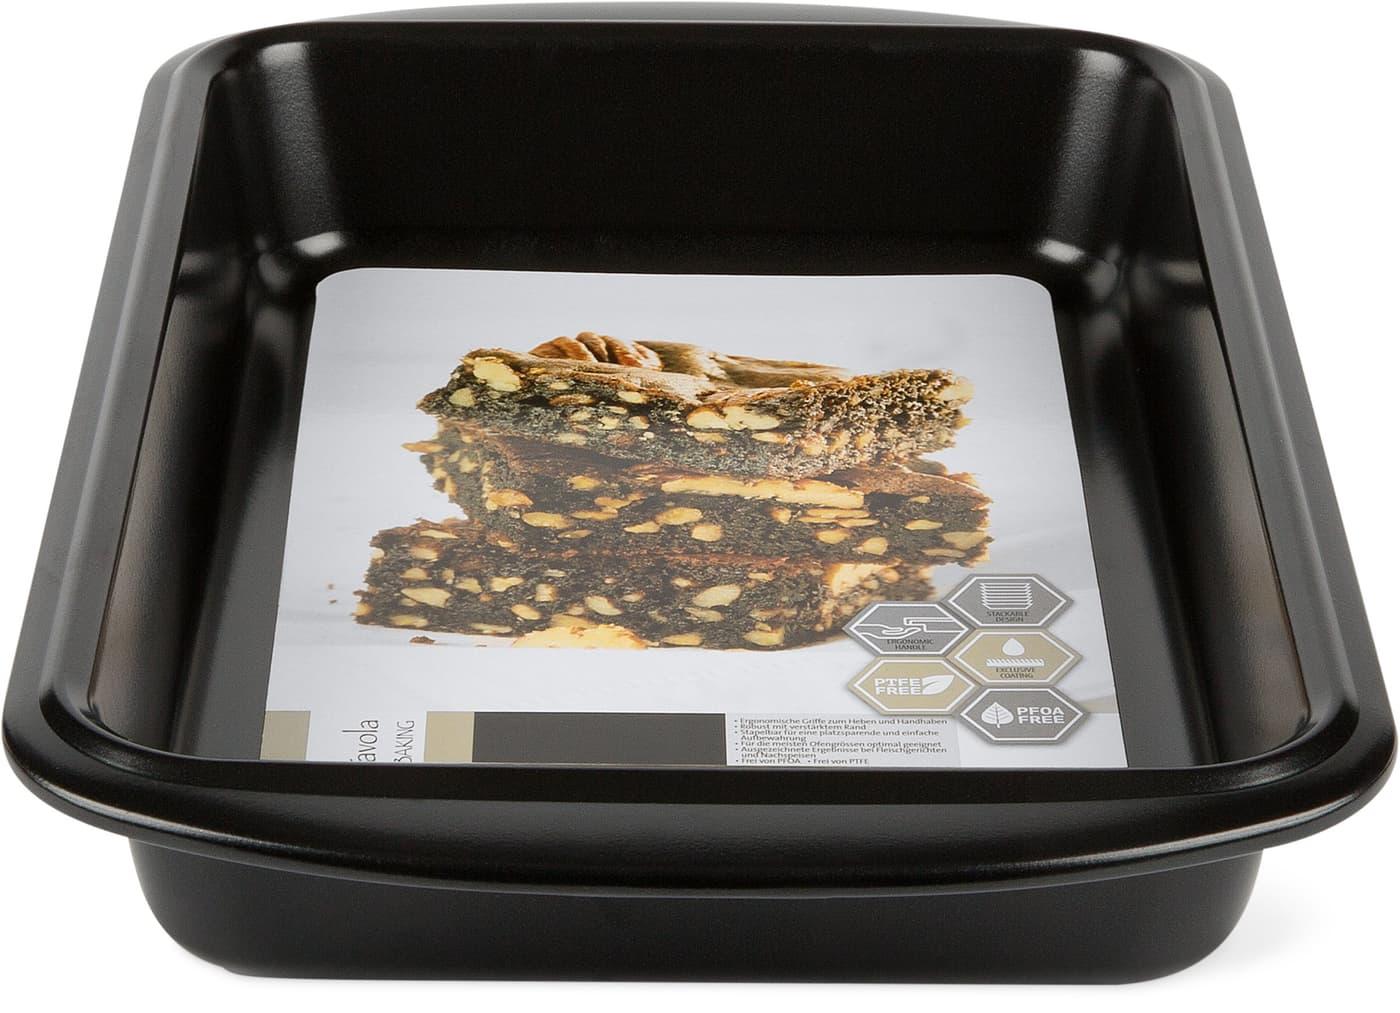 Cucina tavola cucina tavola brownies form migros for Tavola cucina